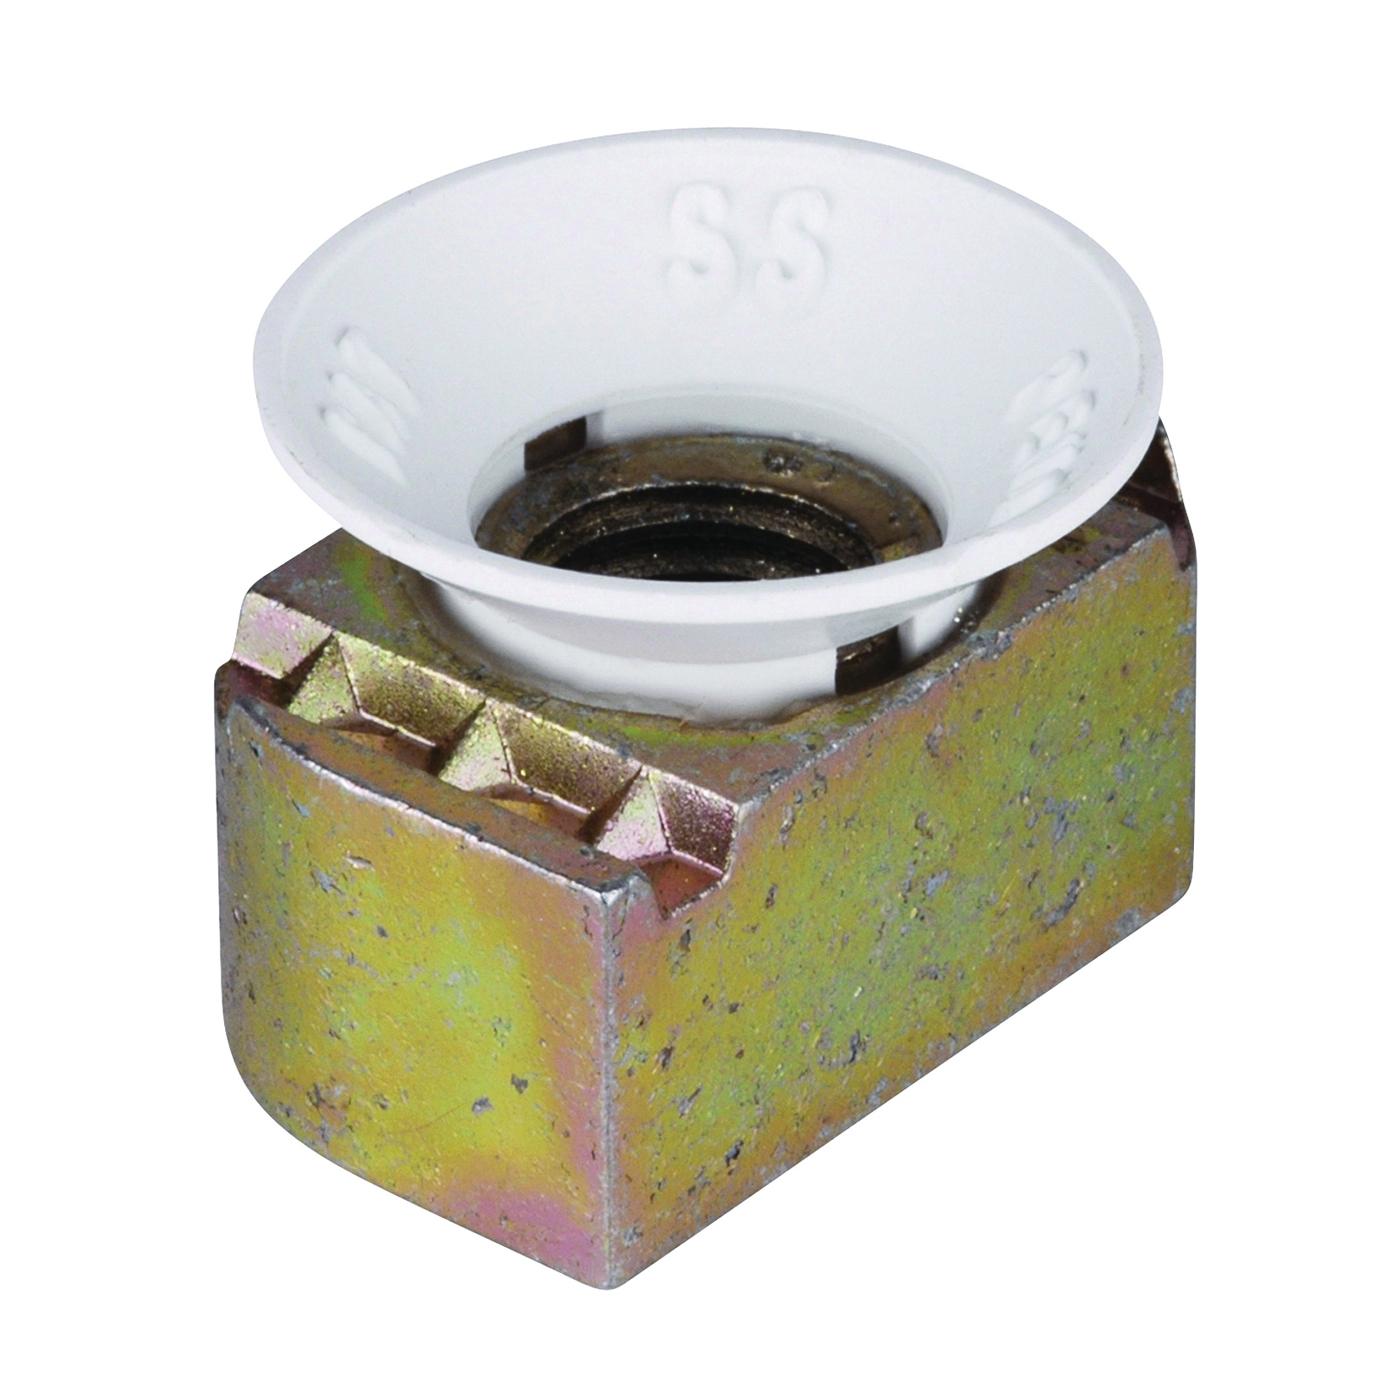 Picture of SuperStrut ZCM1001/4-10 Cone Nut, Nylon/Steel, Gold, Galvanized